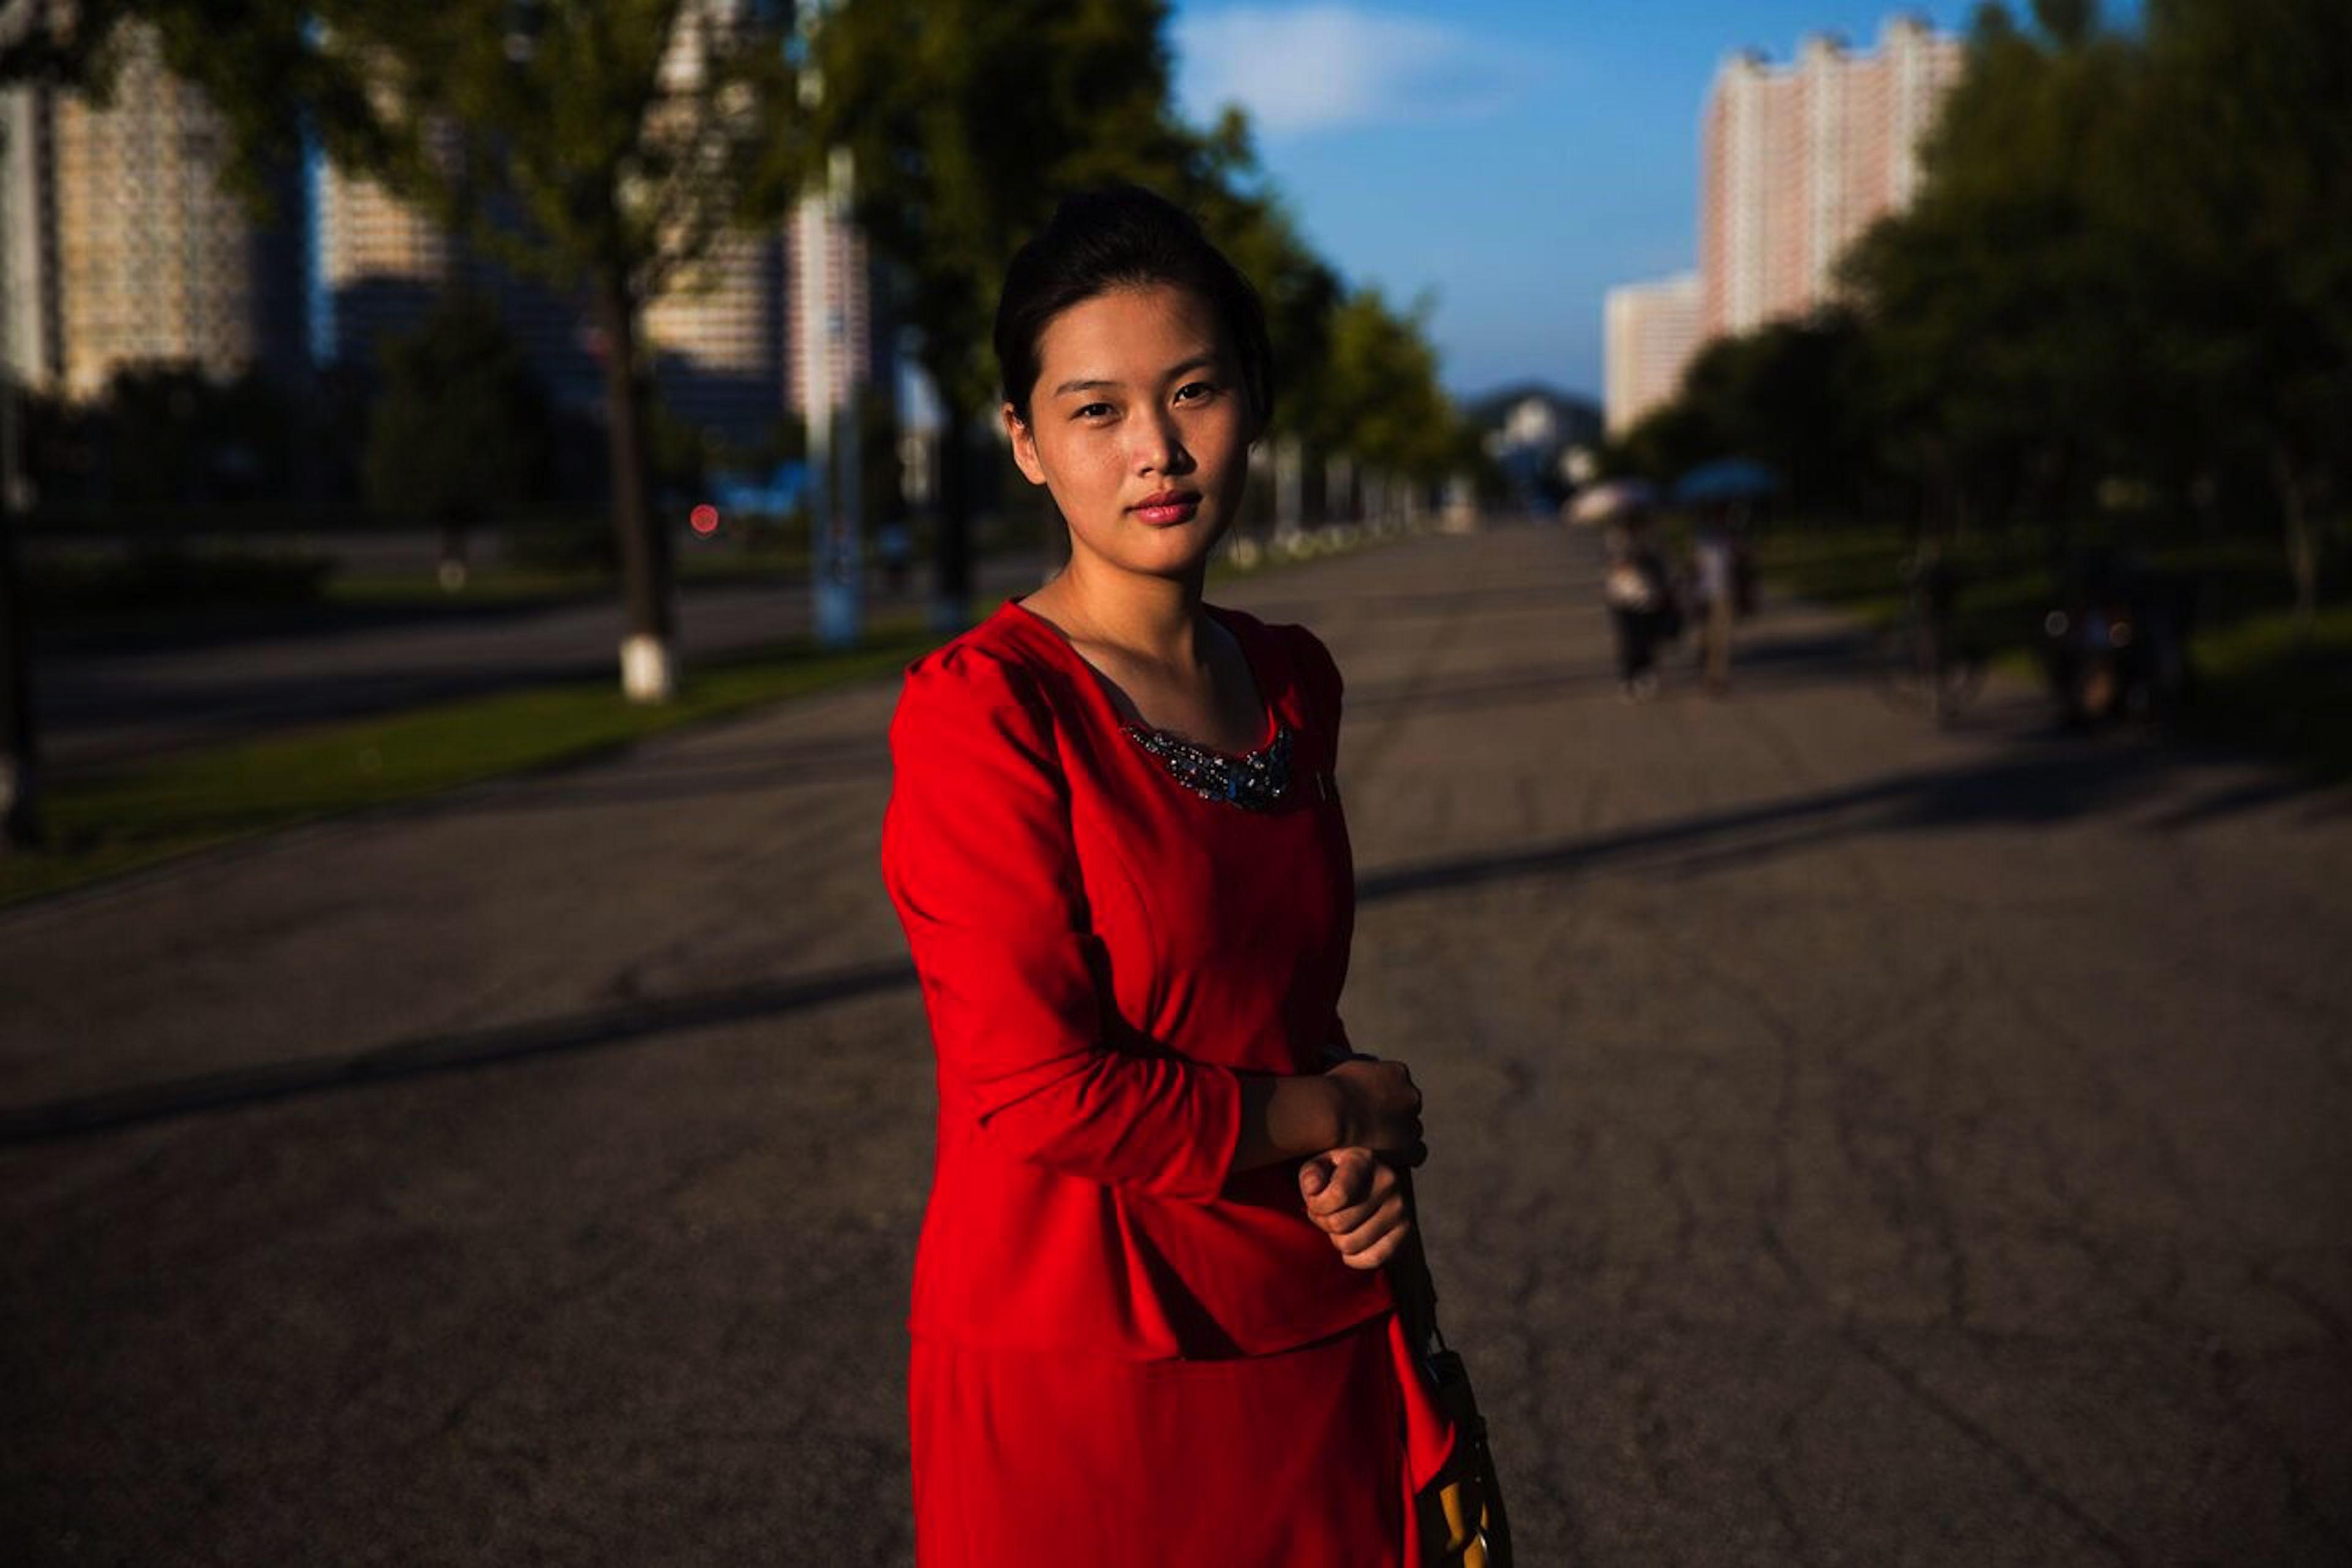 Photos A Striking Glimpse Of Womens Street Style In North Korea  Quartz-6904